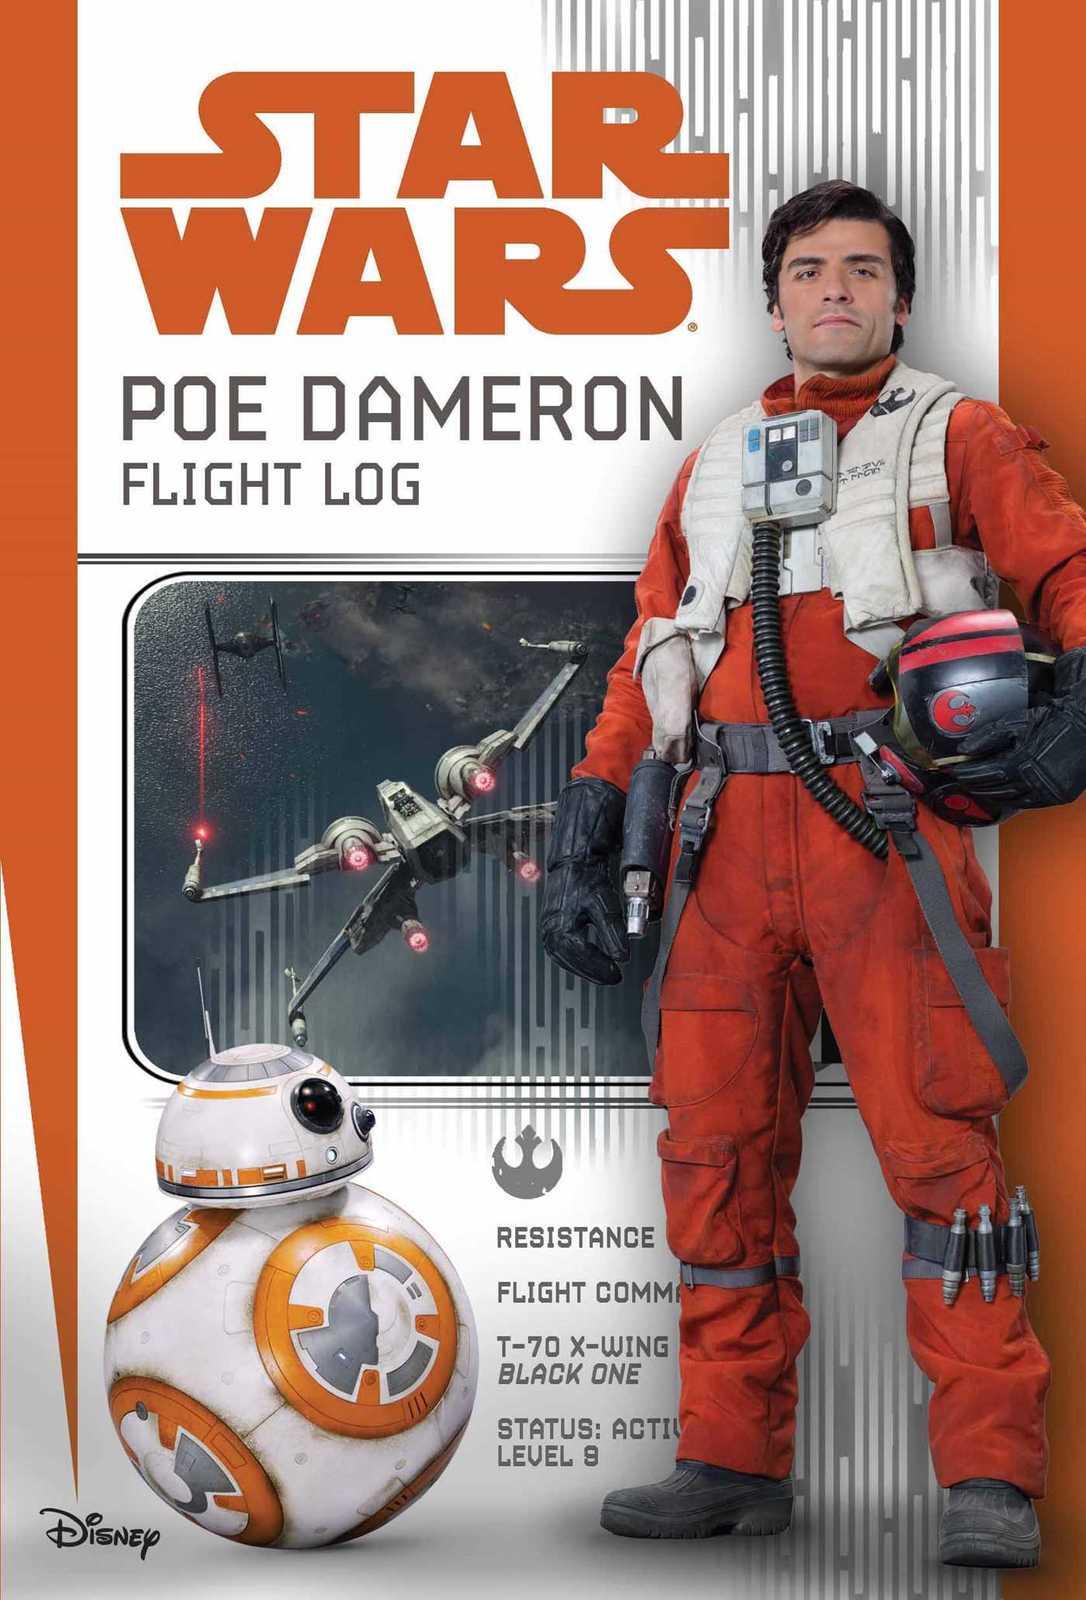 Star Wars: Poe Dameron: Flight Log by Michael Kogge image